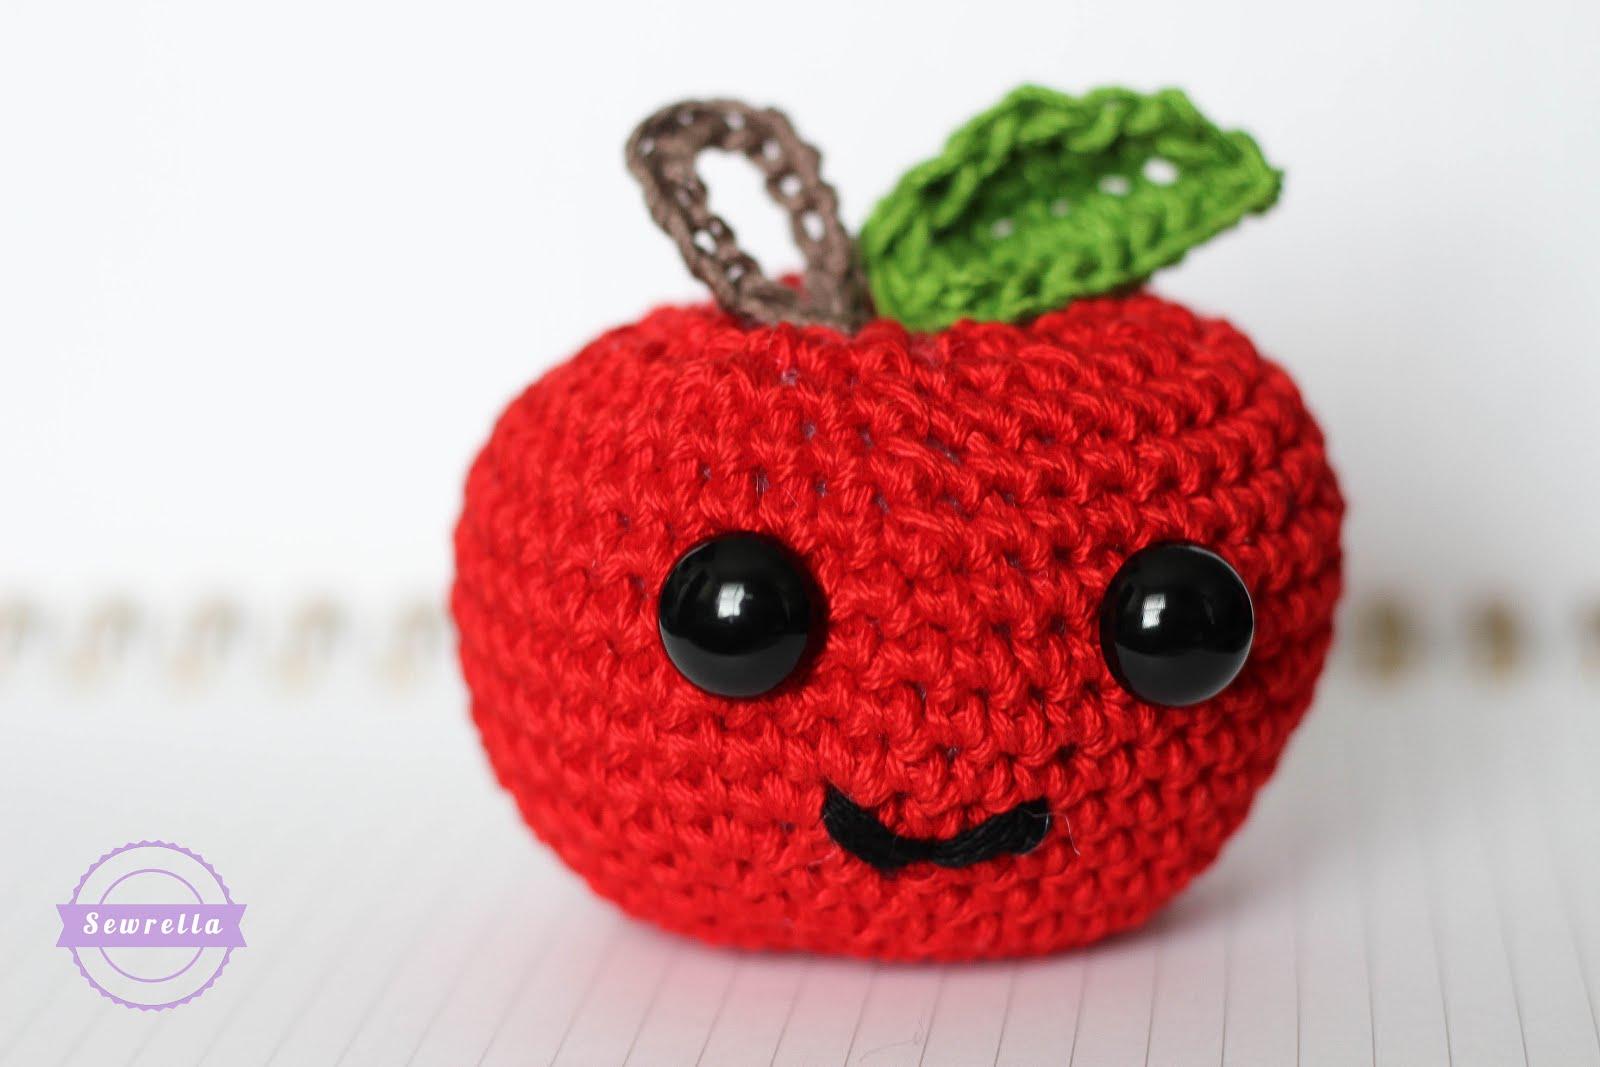 Amigurumi Food : Amigurumi apple back to school series sewrella